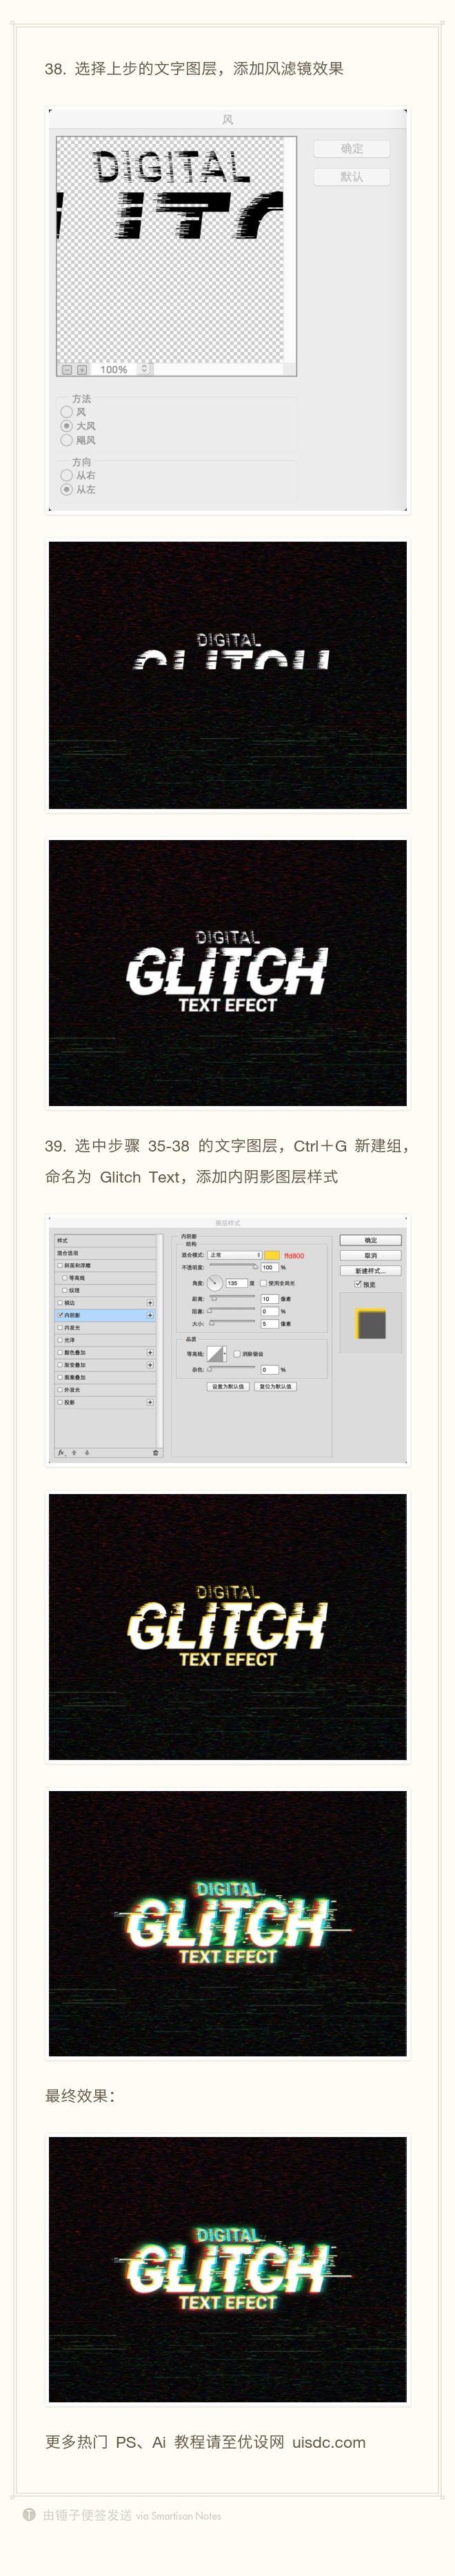 Photoshop製作顯示器故障特效的藝術字教程